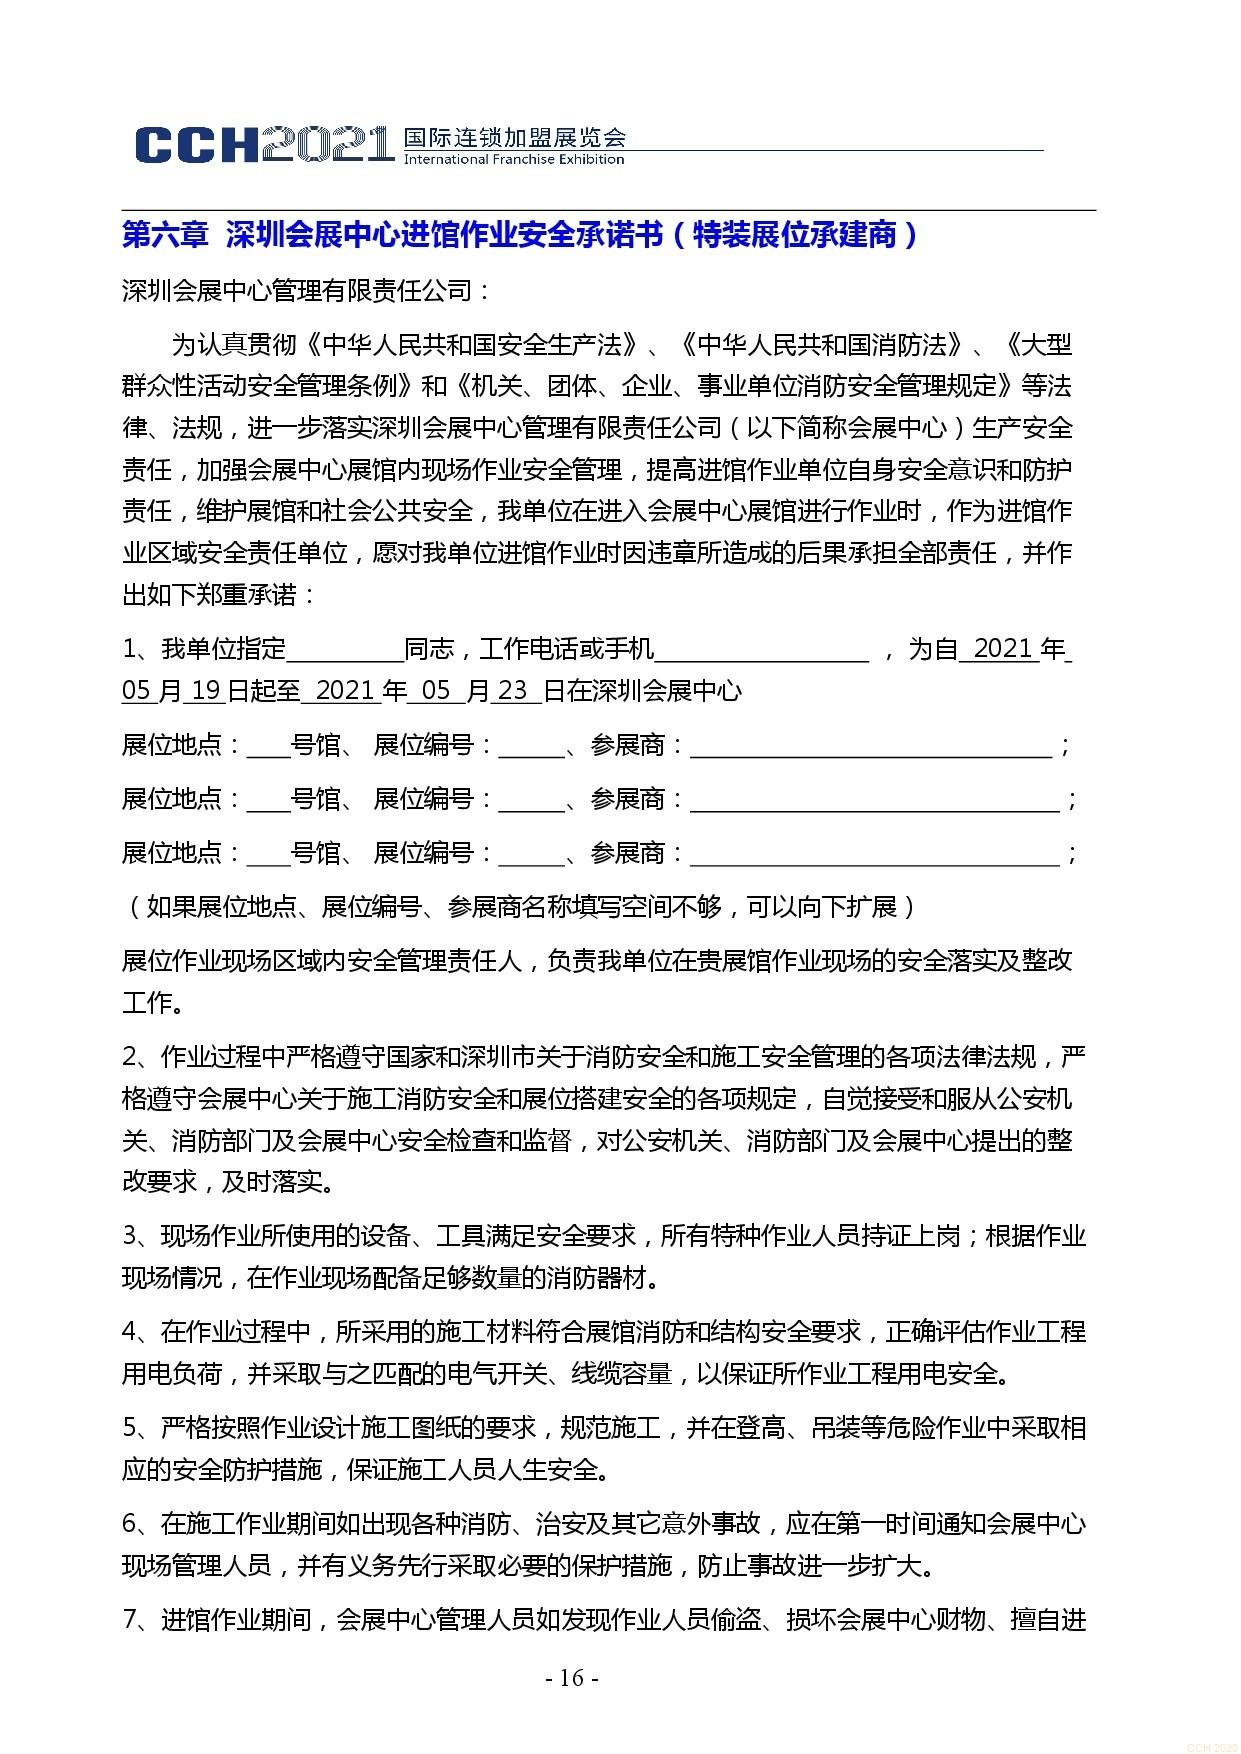 0416CCH深圳展参展商手册4.16-016.jpg